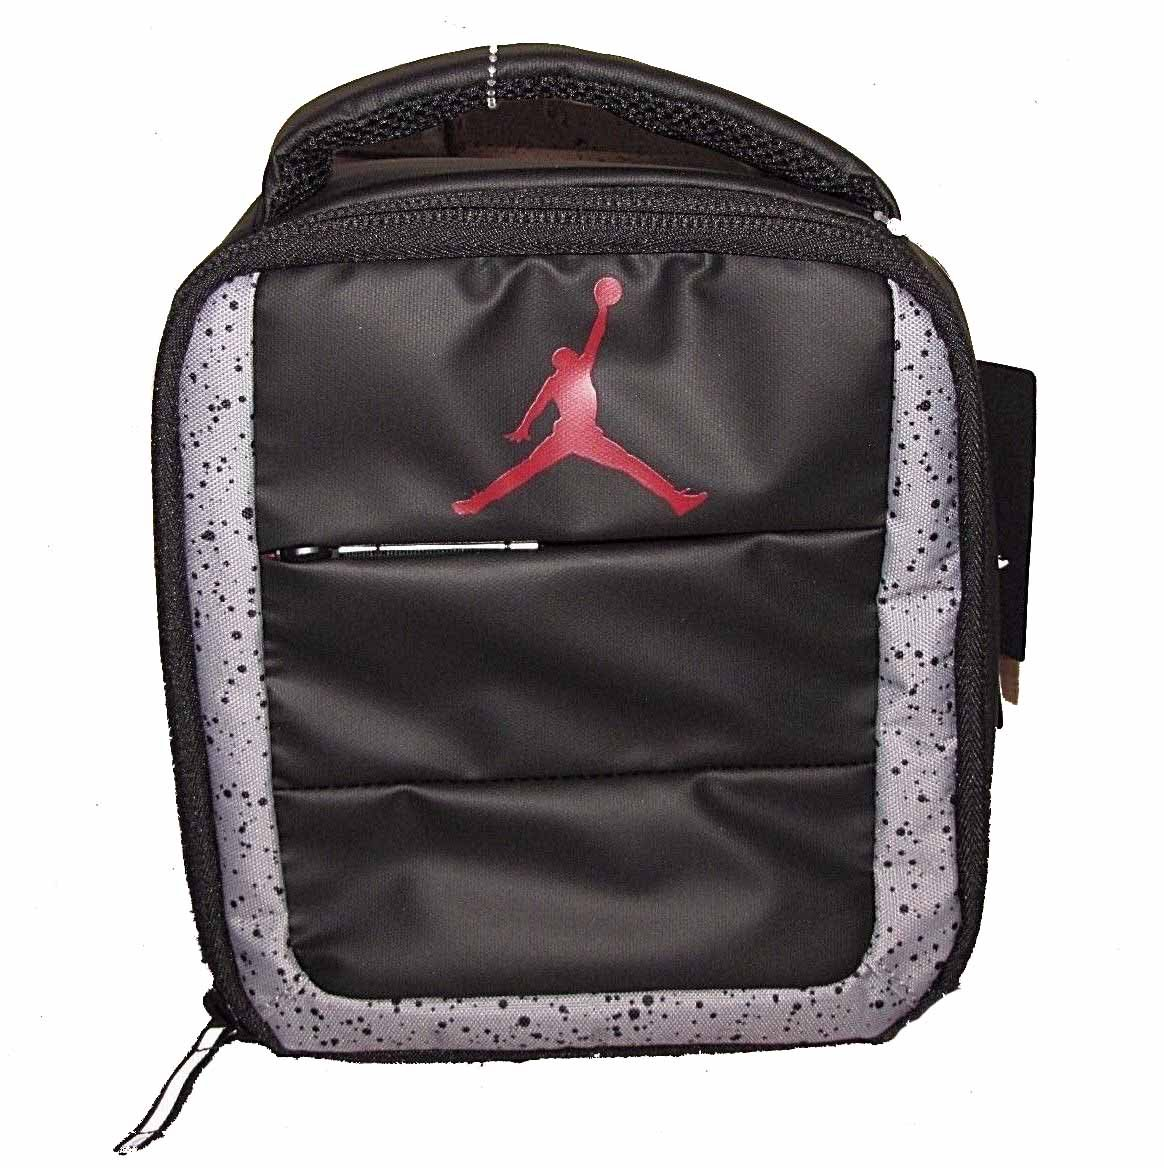 Nike Air Jordan Standing Up Right Lunch Tote Bag